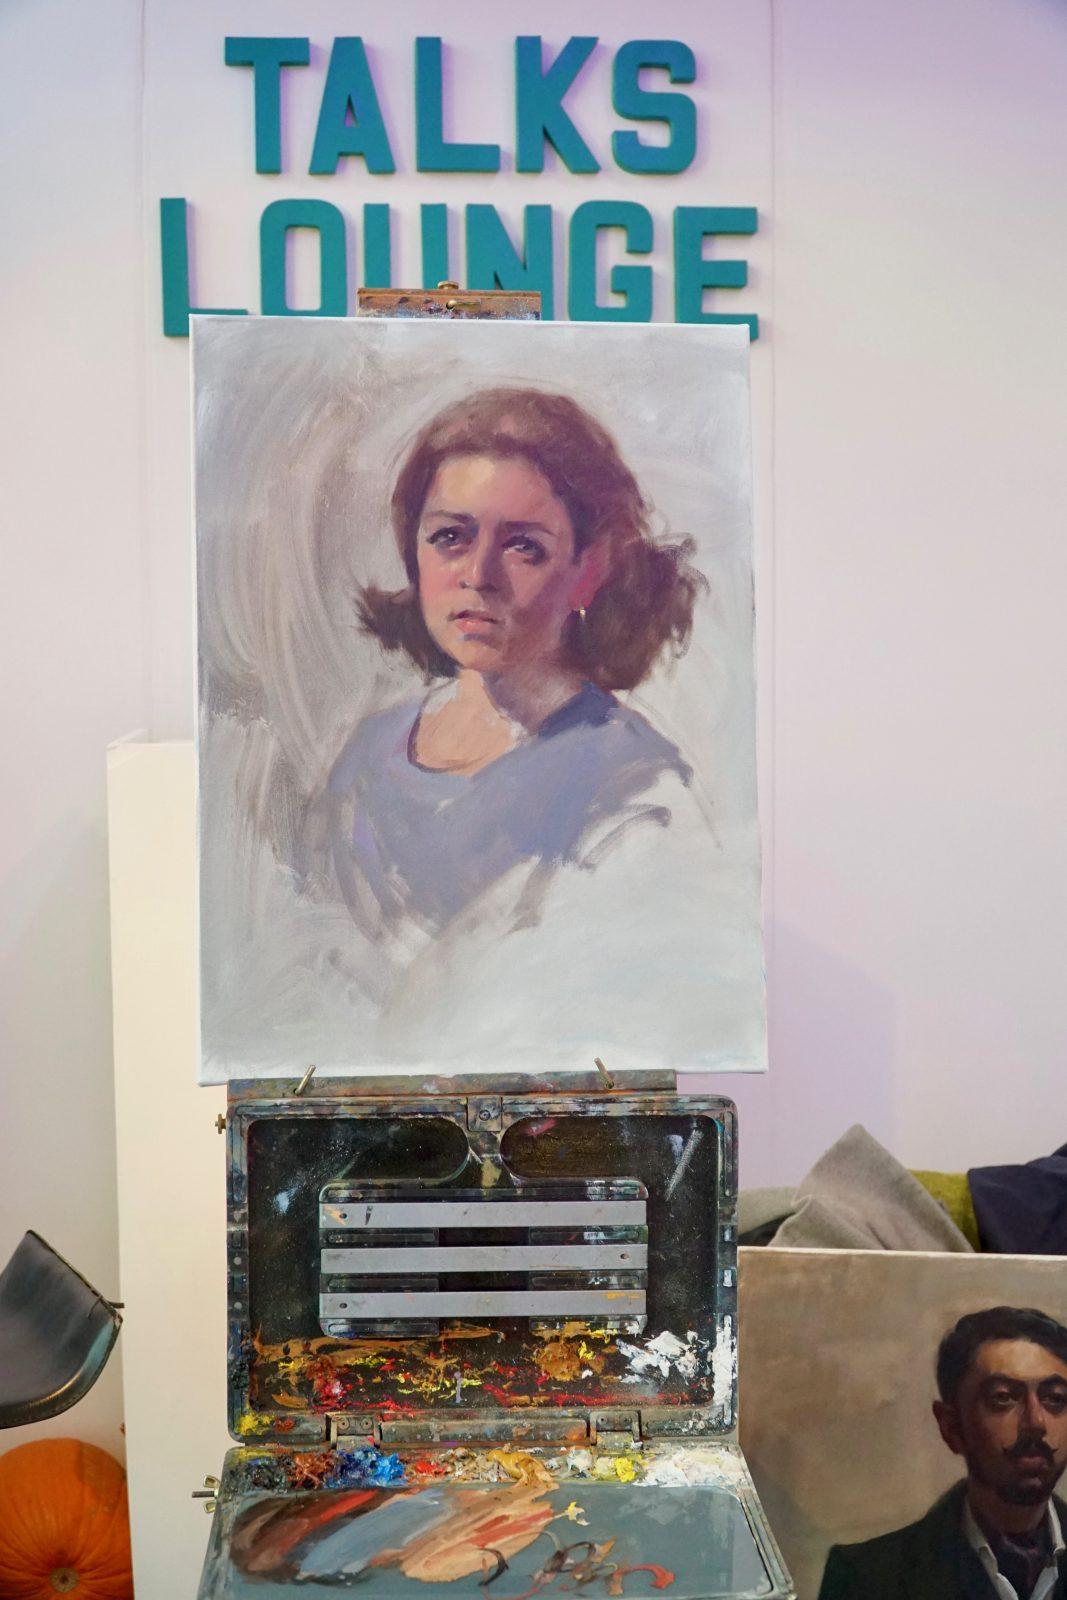 painting demo, oil painting, affordable arts fair, autumn Battersea 2018, Battersea, london art, london, art classes, fine art classes, painting workshops, art london, art studios, affordable art fair london